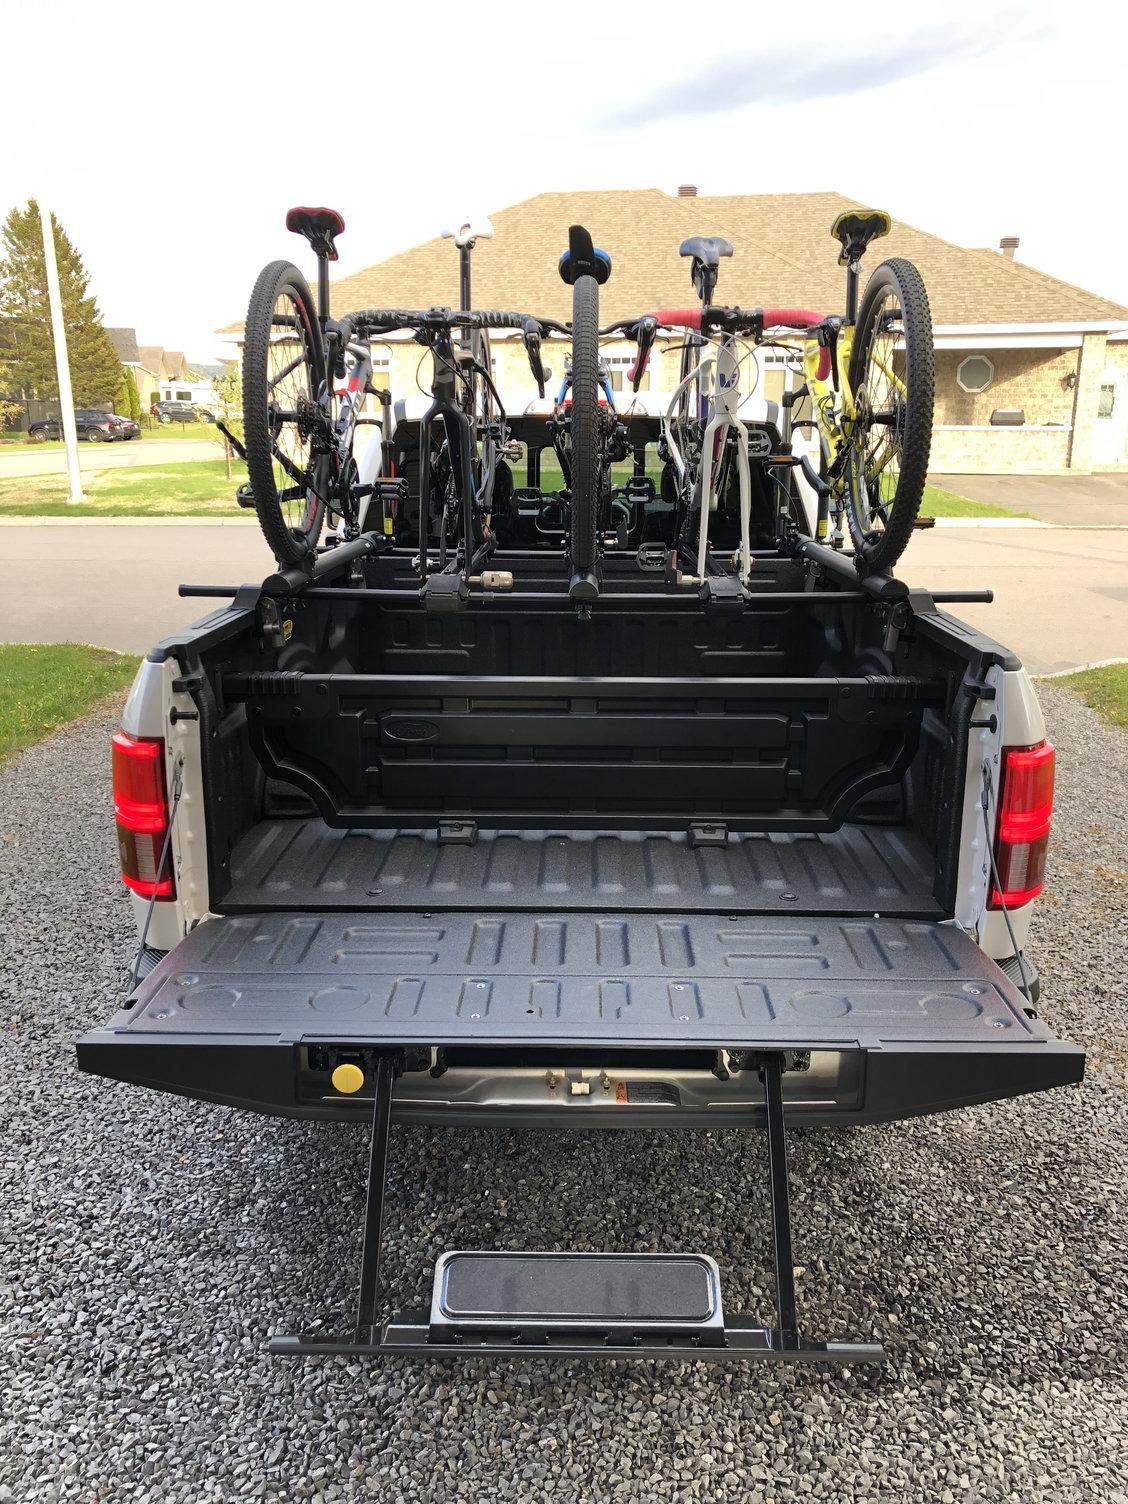 Ford F150 Bike Rack : Bikes, Forum, Community, Truck